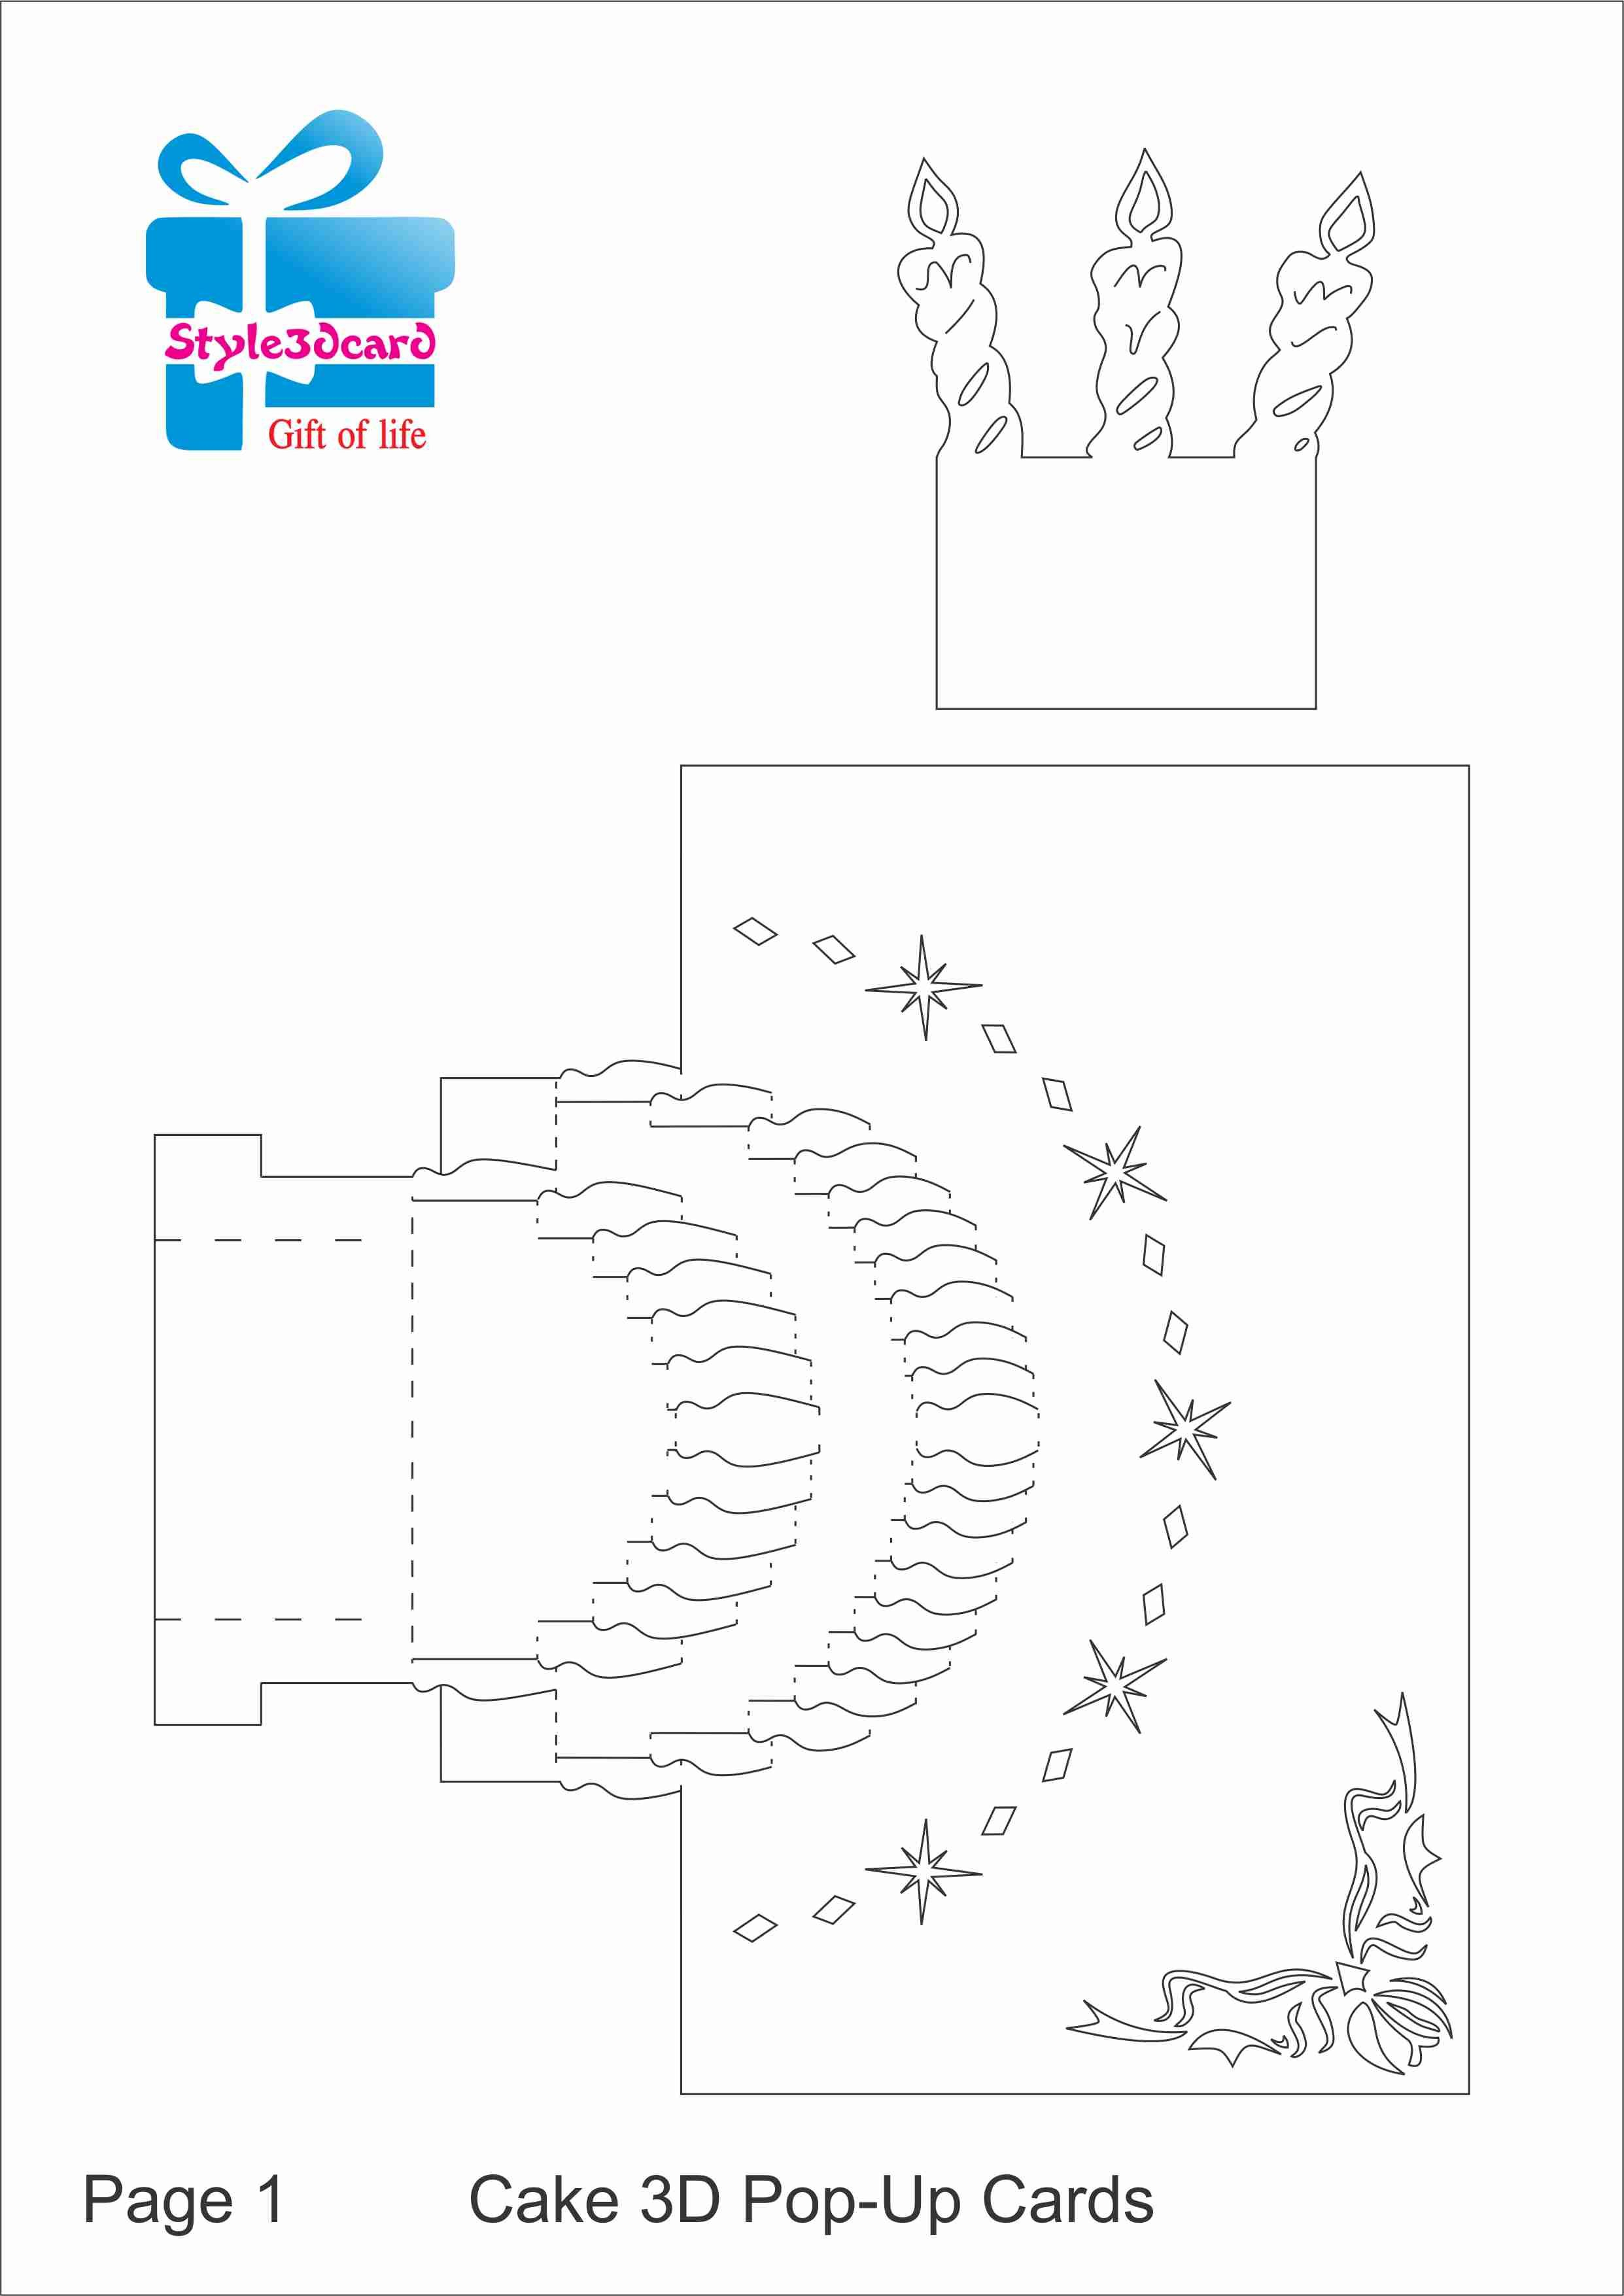 Happy Birthday-Cake-3D-Pop-Up-Greeting-Card/ Kirigami Pattern 1 - Free Printable Kirigami Pop Up Card Patterns